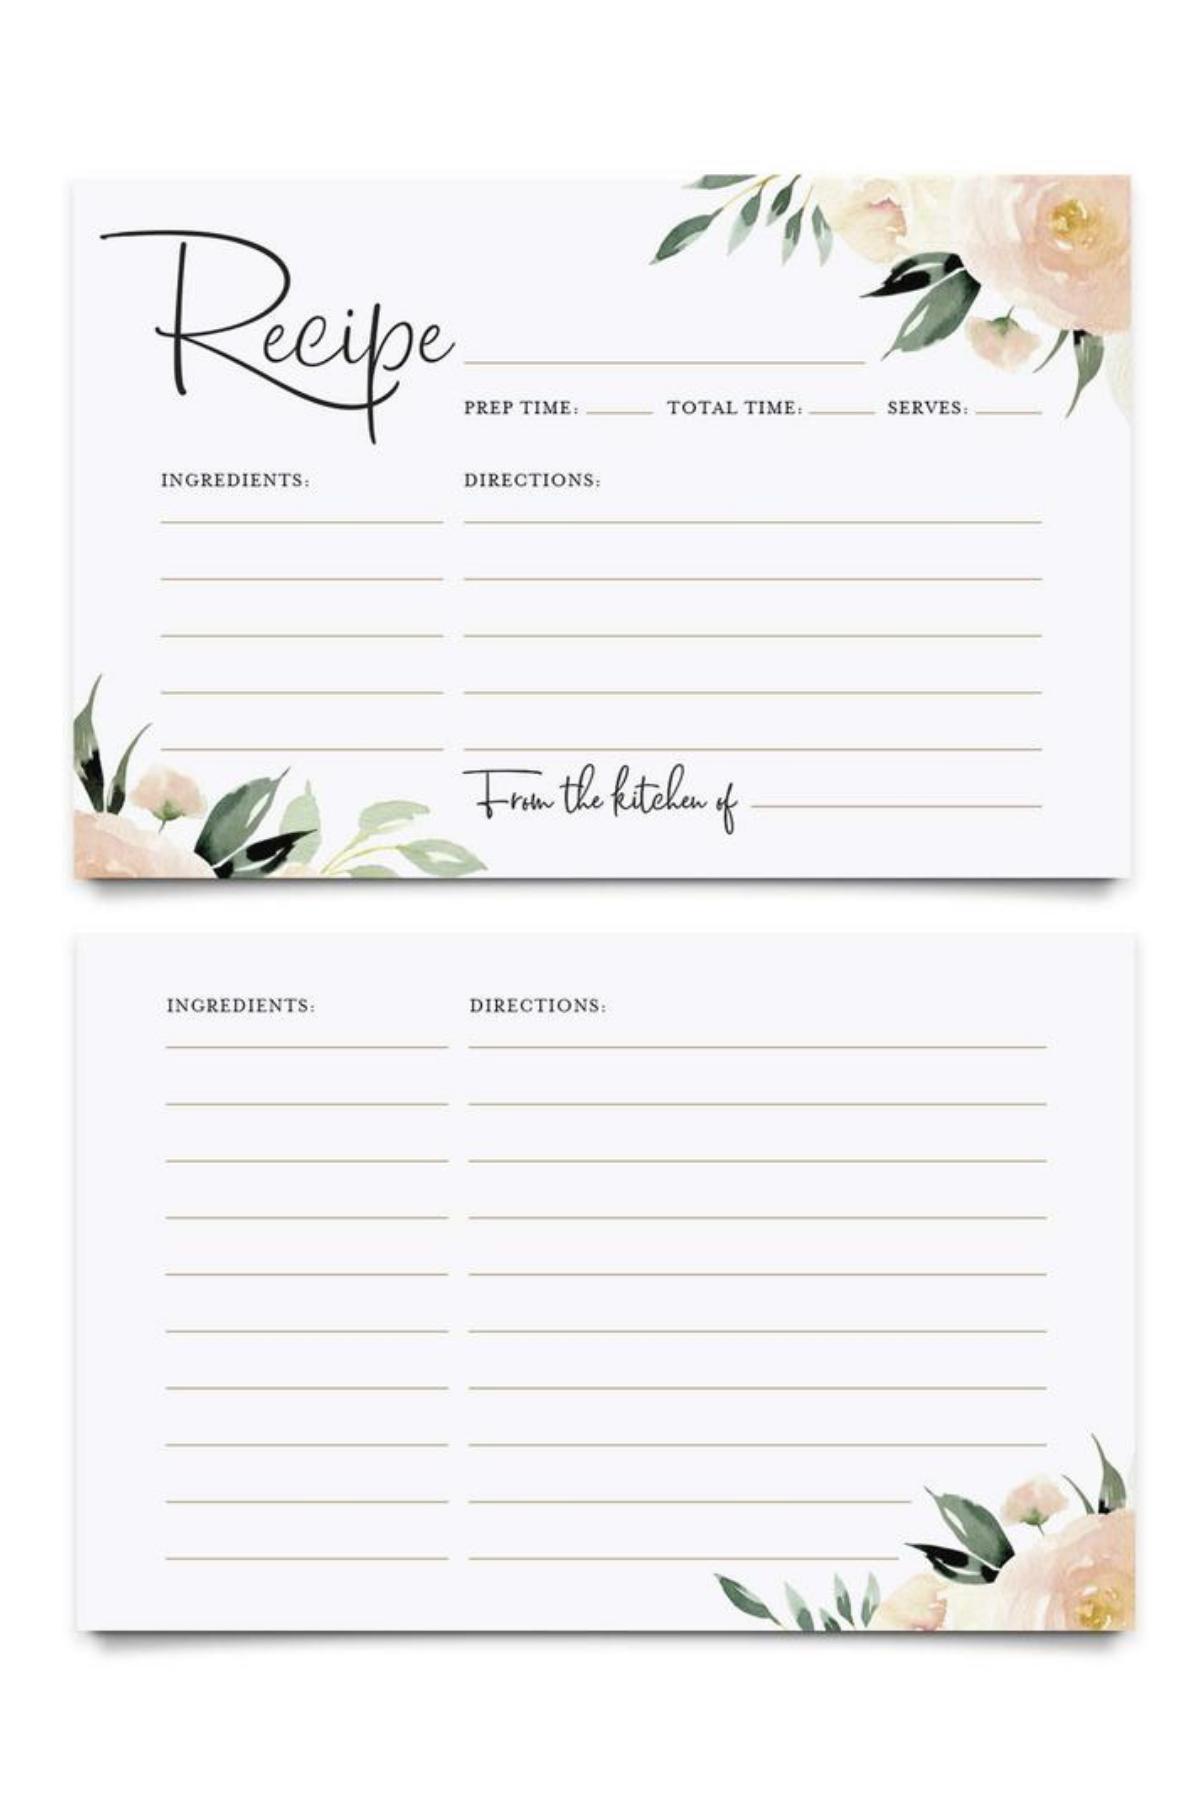 Greenery DIY Recipe Card Recipe Card Printable Printable Recipe Card Bridal Shower card 4x6 Bridal Shower Recipe Card